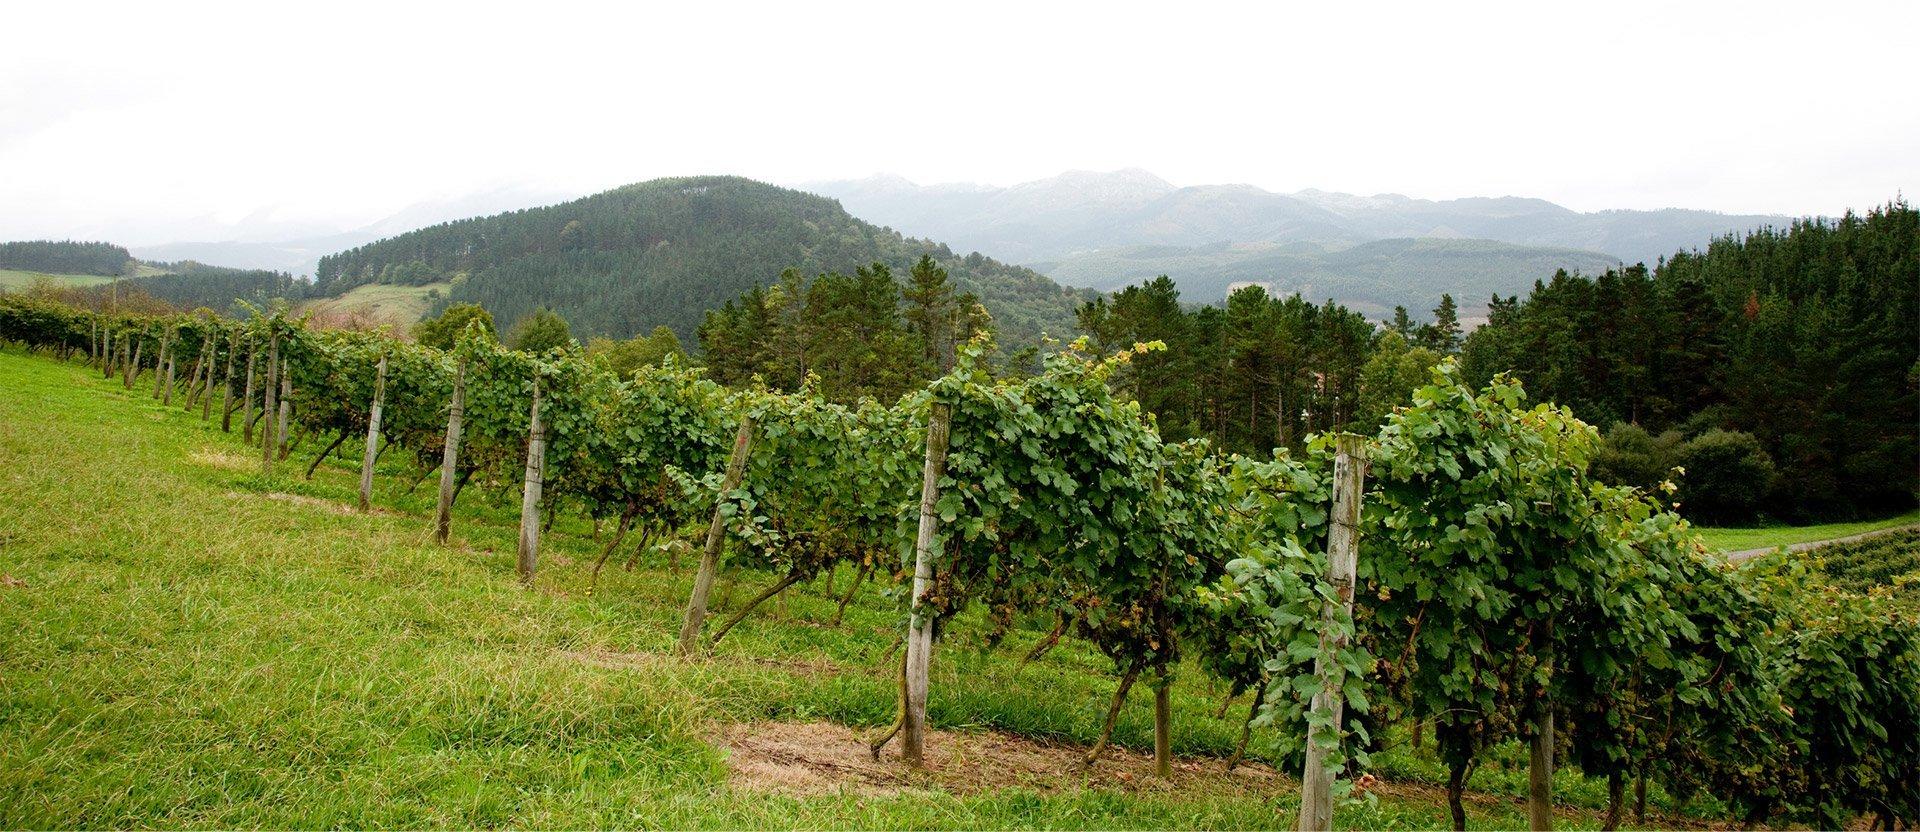 <h1>Winery</h1>